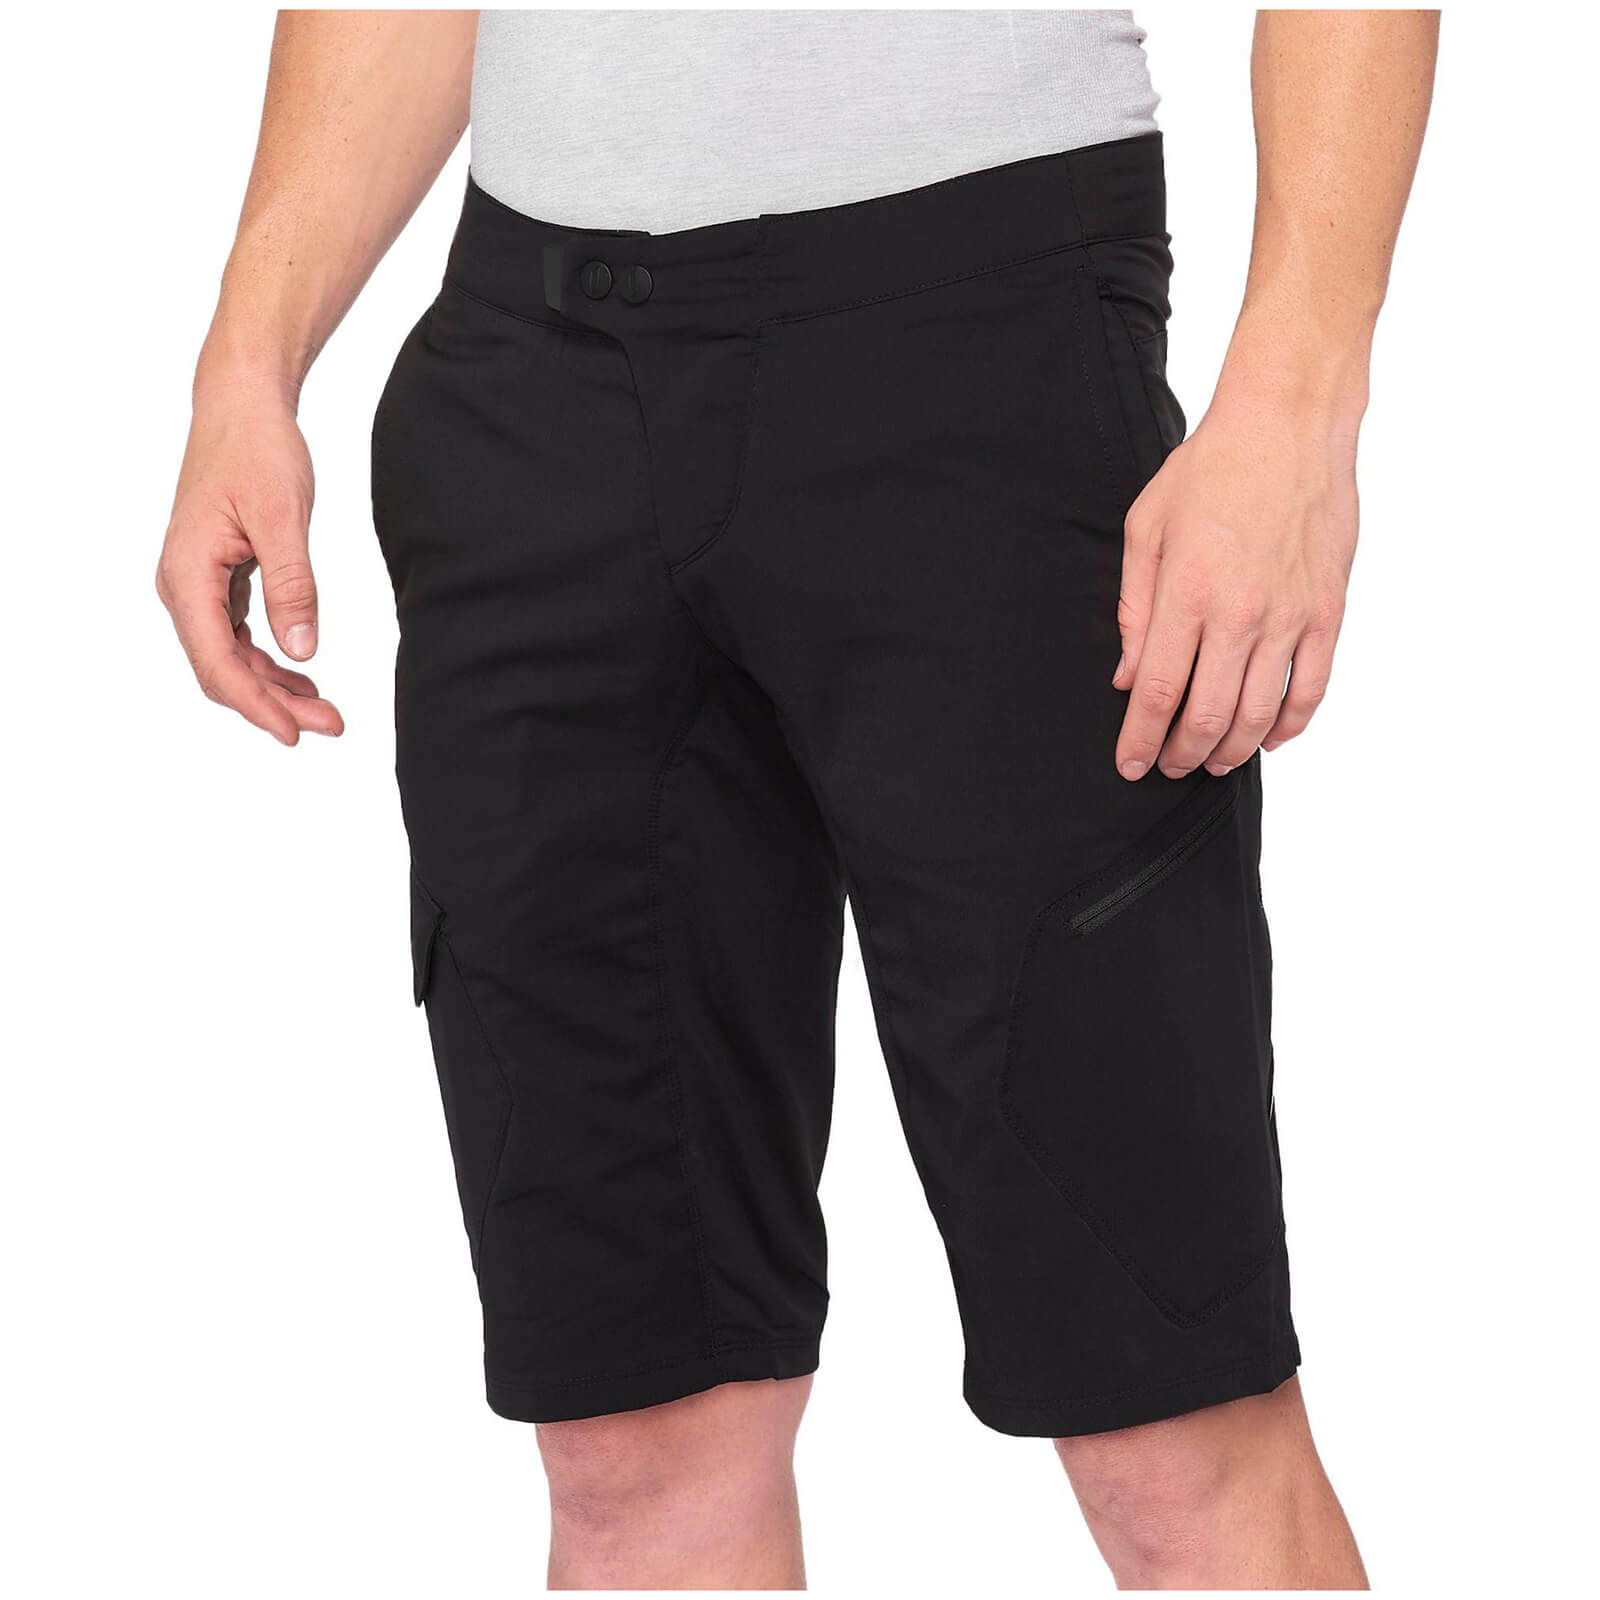 100% Ridecamp Mtb Shorts - 36 - Black